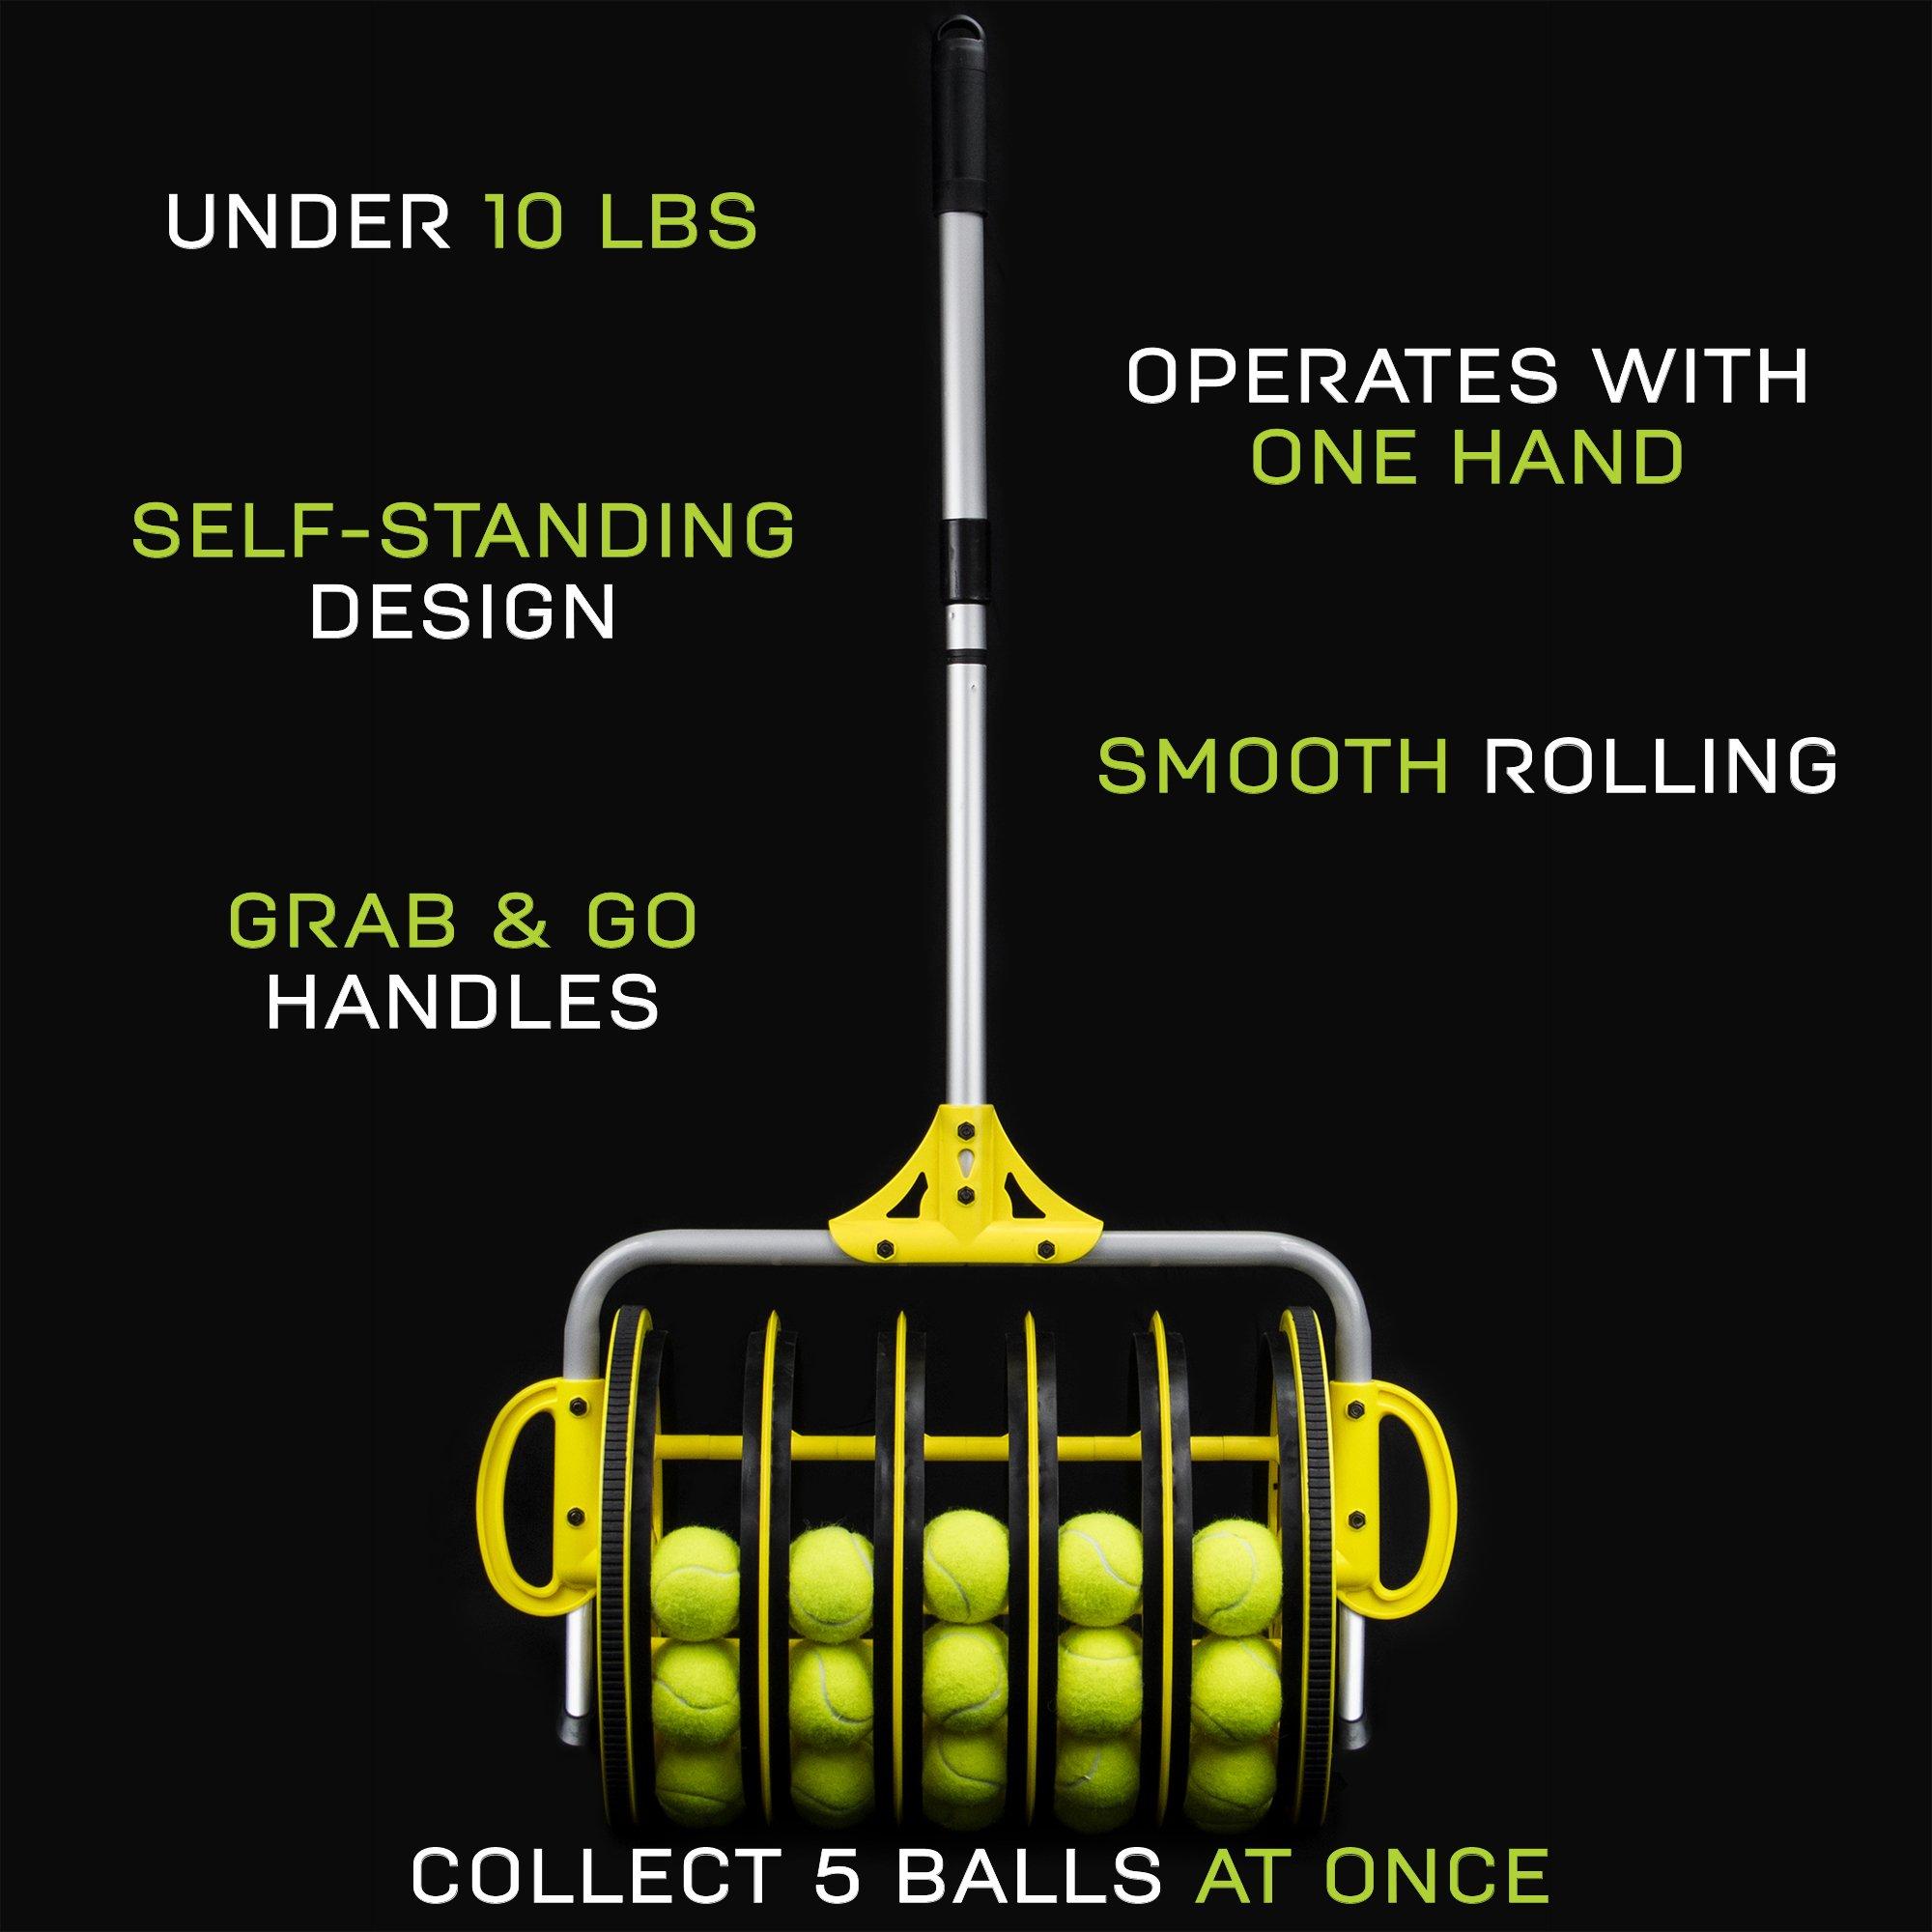 Deluxe Roller Tennis Ball Collector - Includes 25 Bonus Practice Balls! by Crown (Image #5)